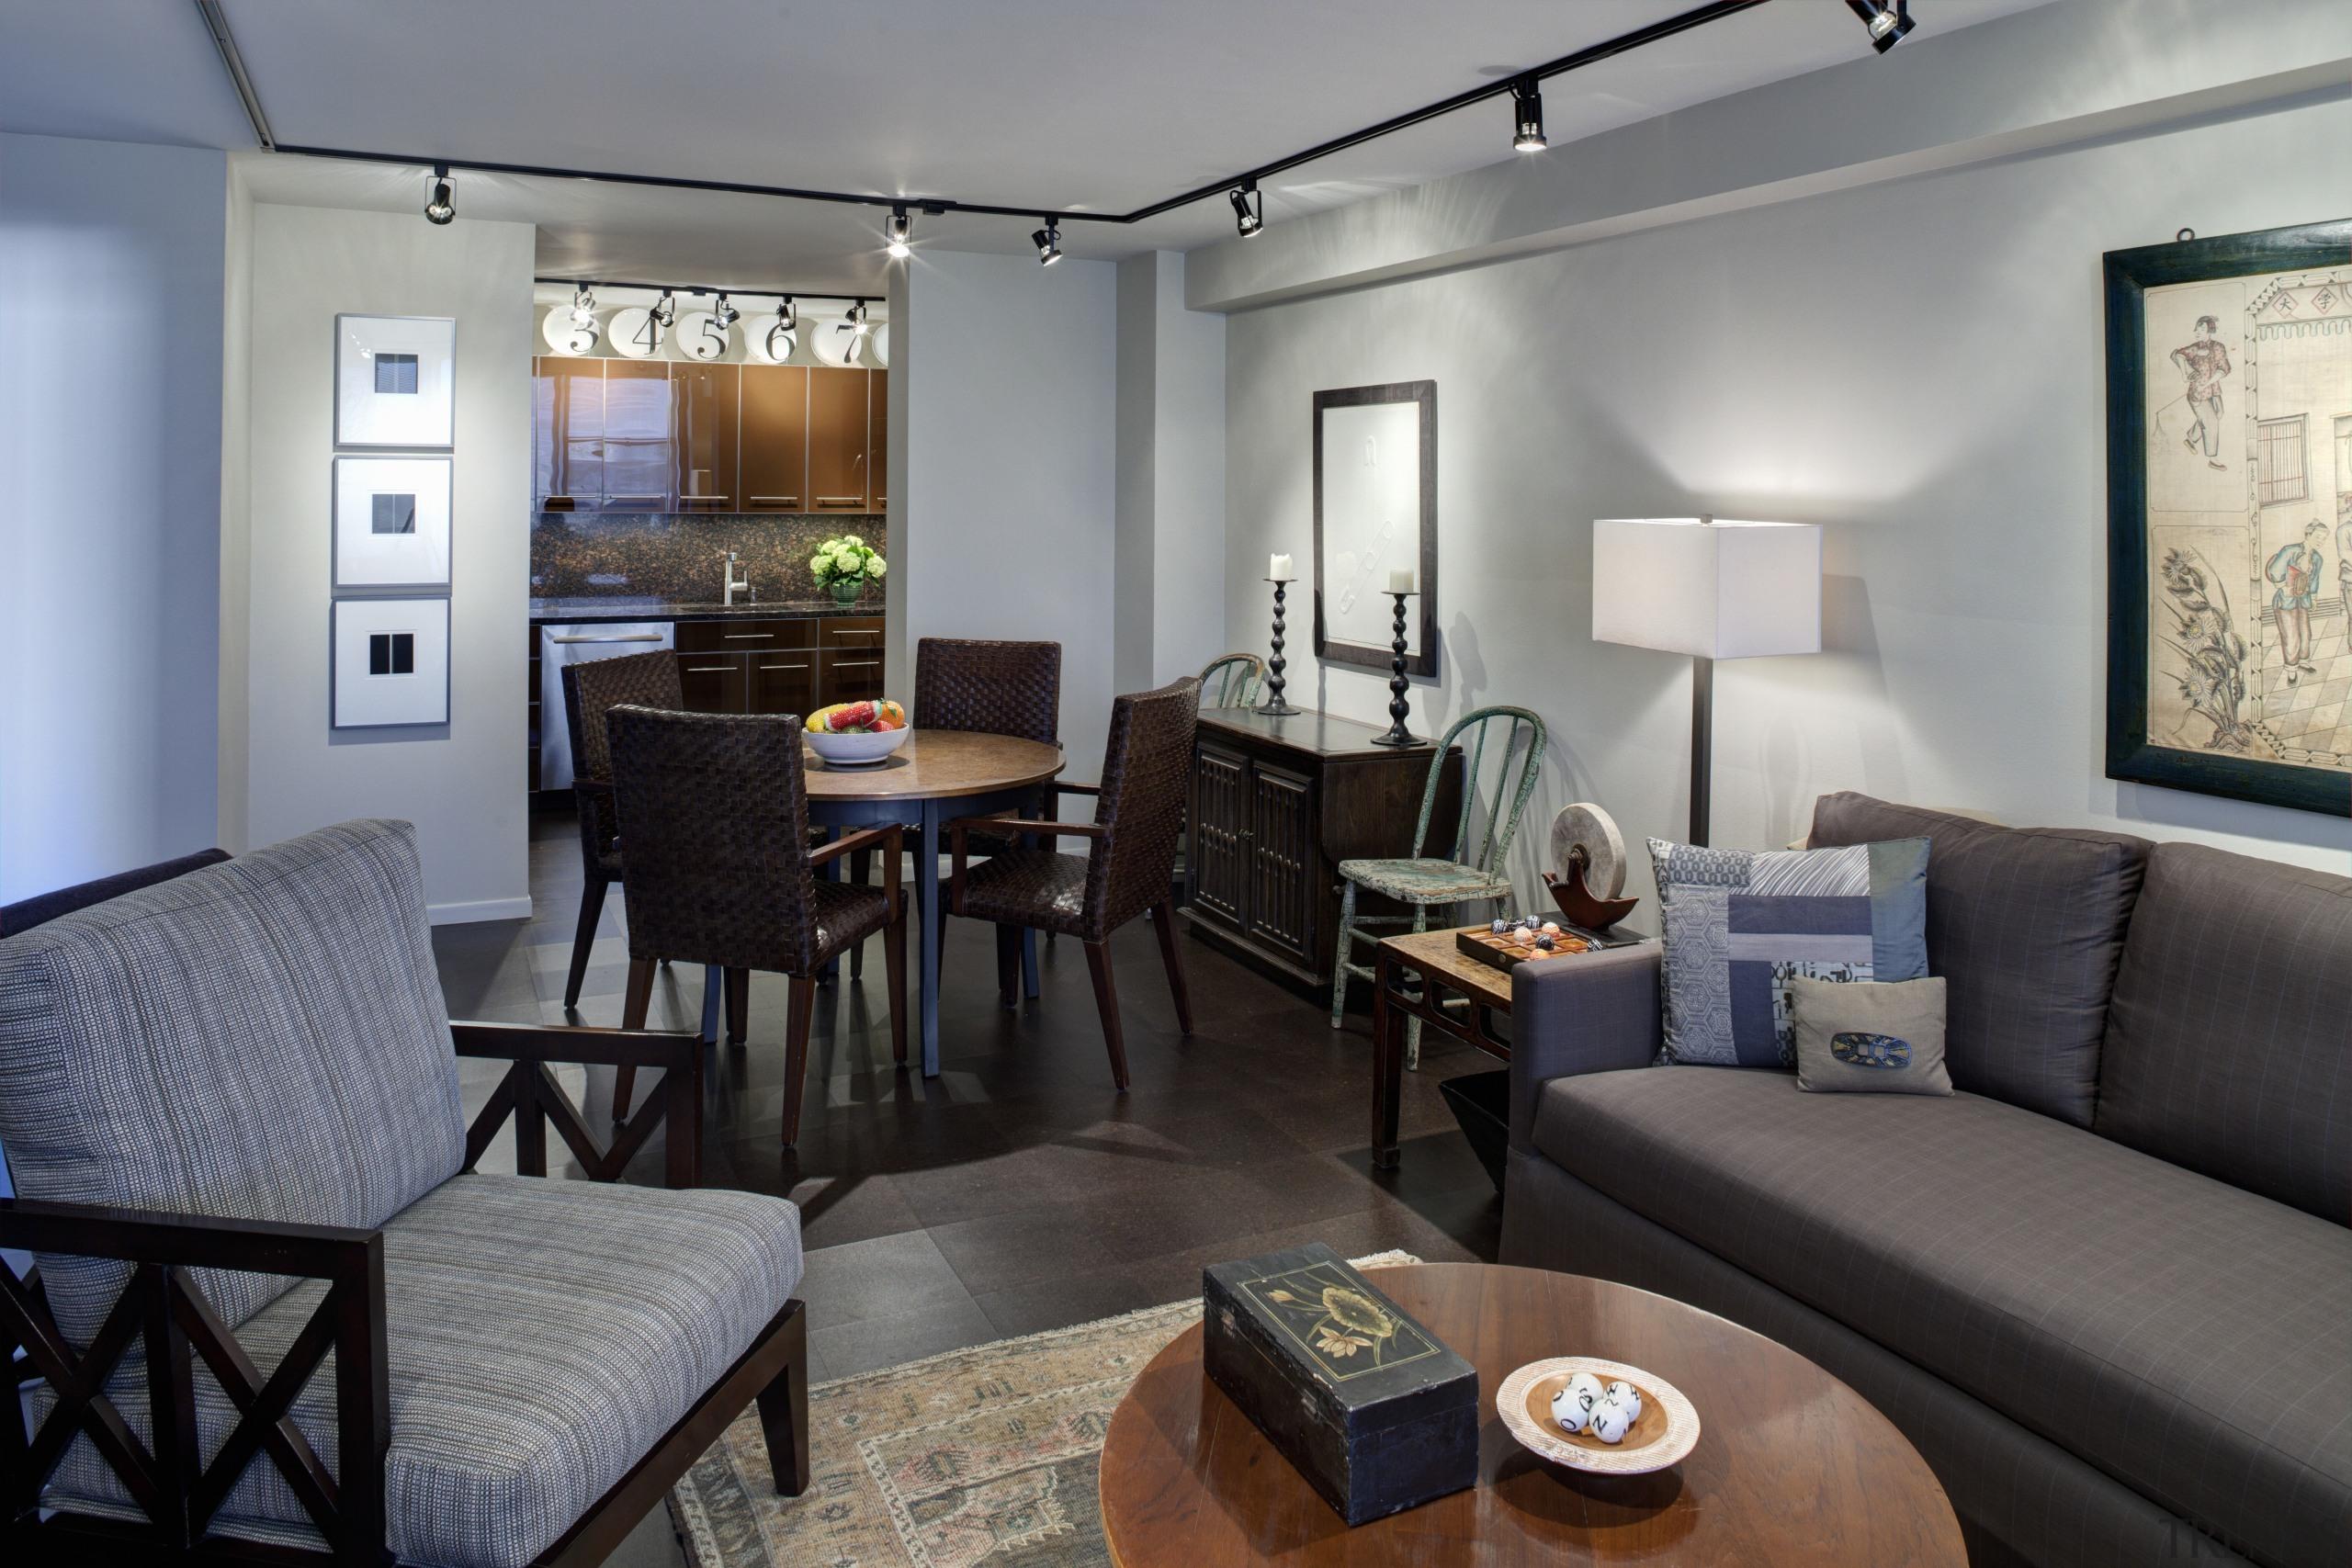 This remodeled kitchen by SemelSnow Interior Desig is interior design, living room, real estate, room, suite, gray, black